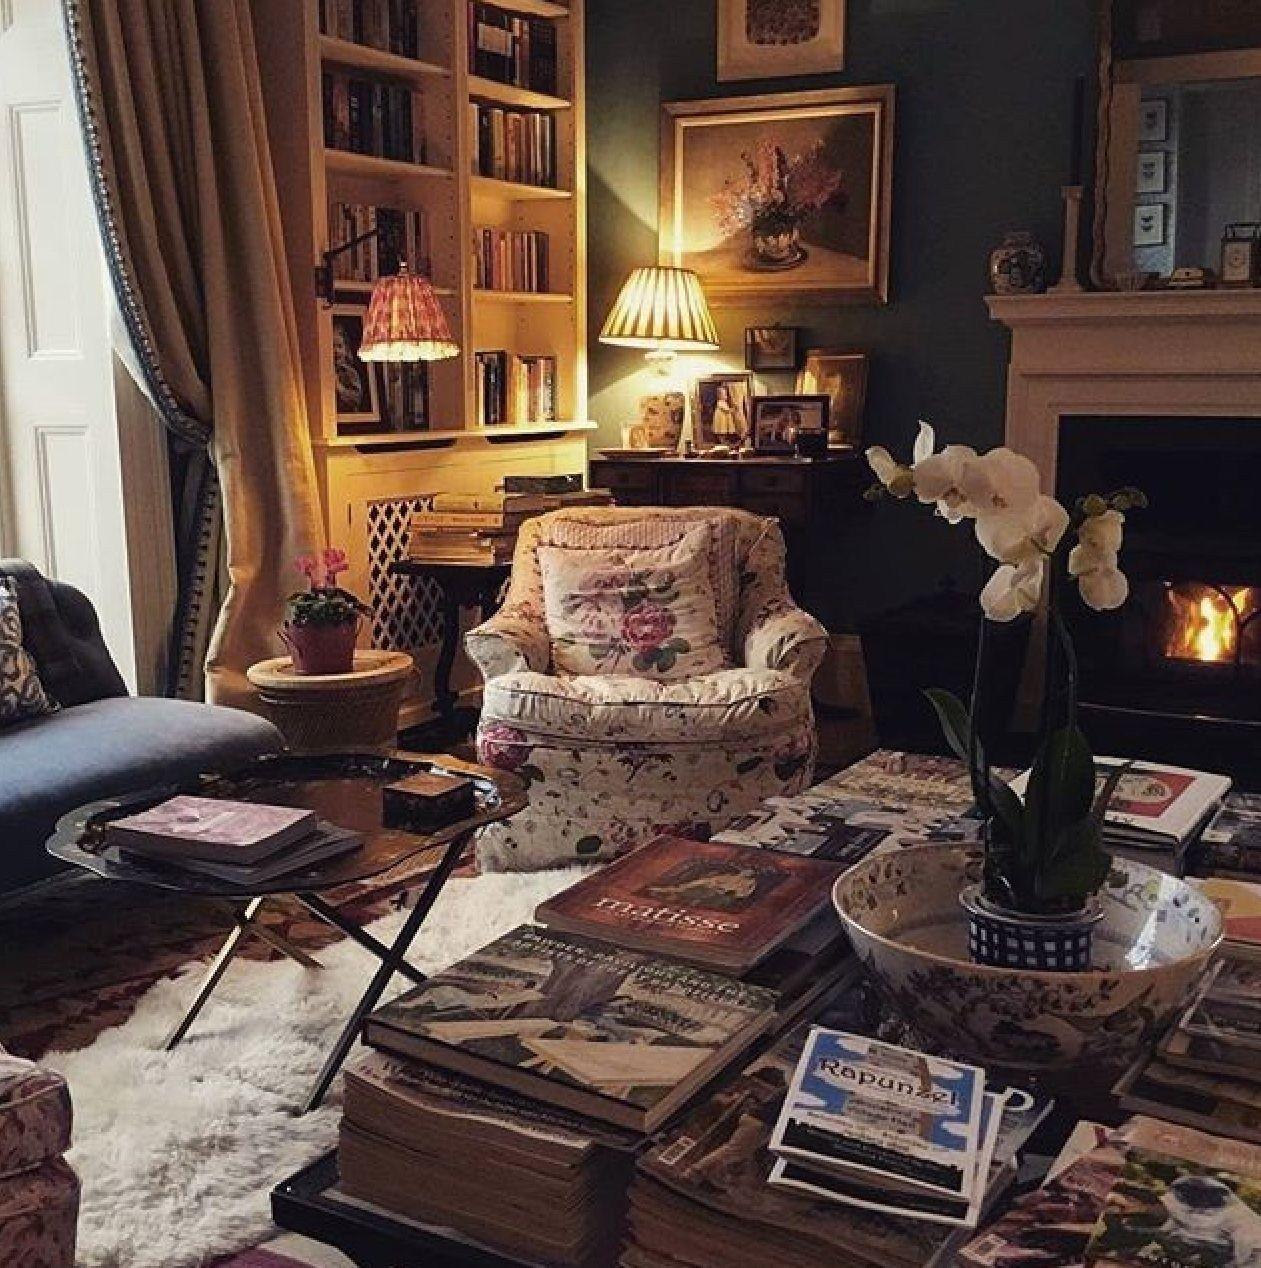 34 Inspiring English Cottage Decor Ideas English Cottage Decor Country House Decor Cottage Living Rooms